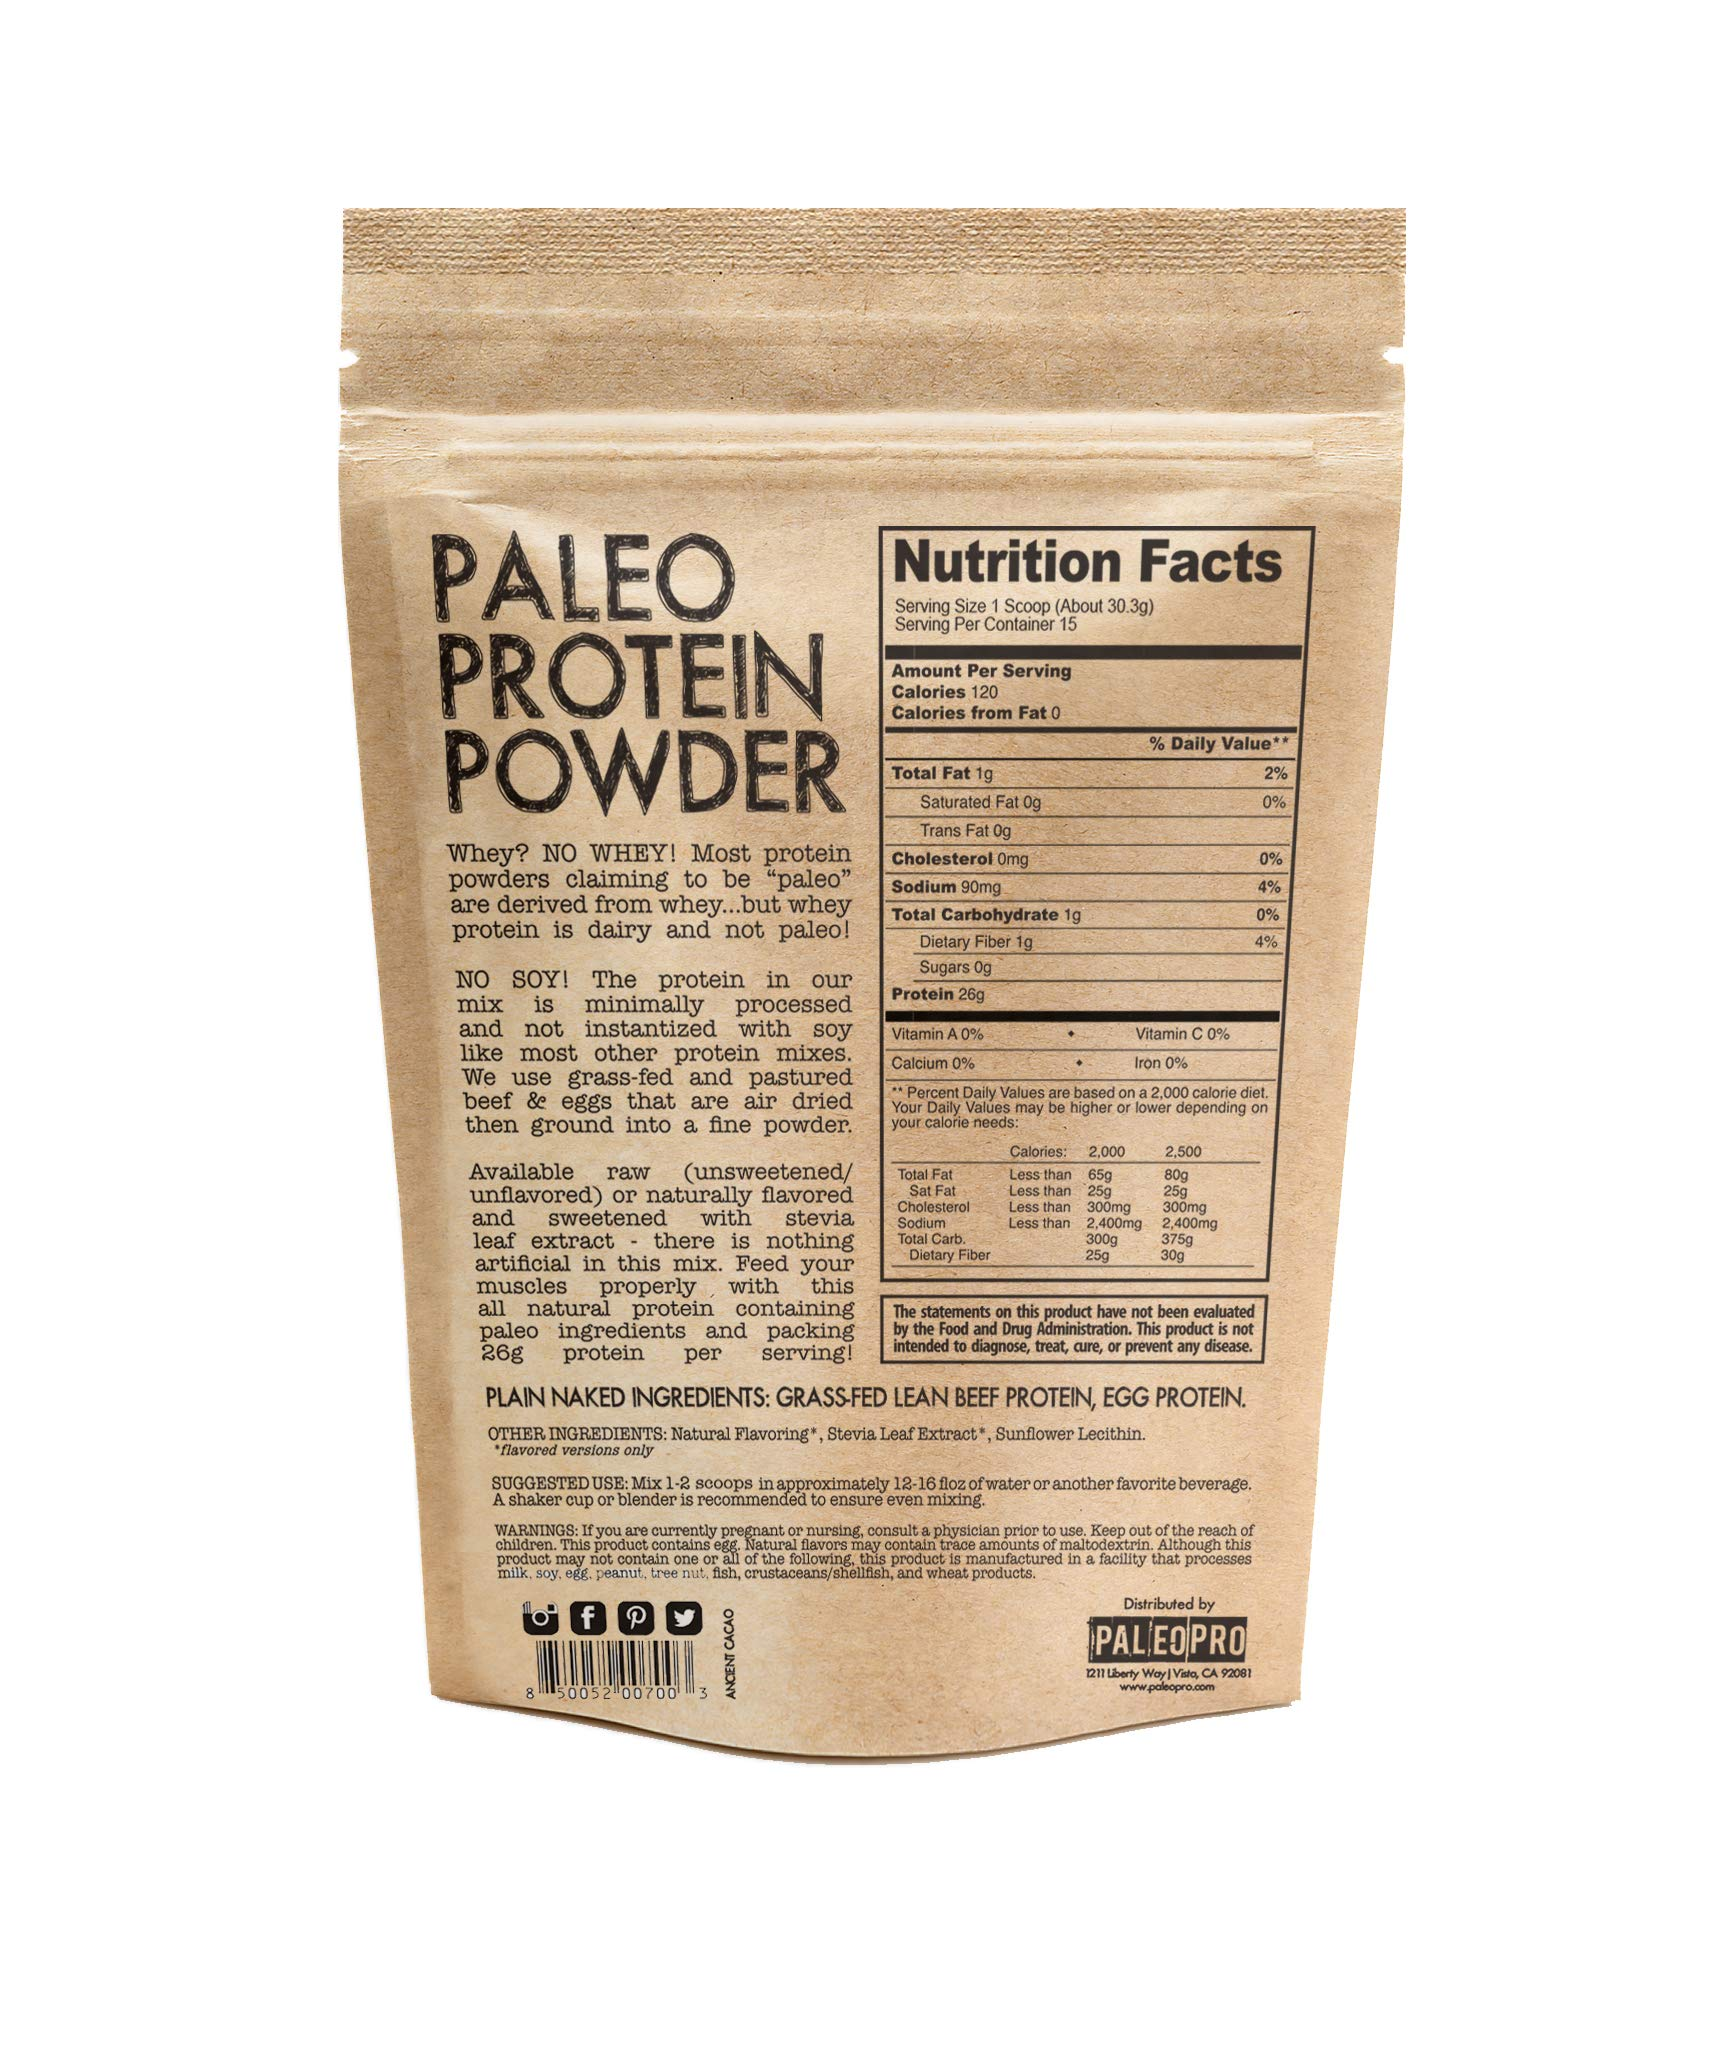 PALEOPRO Protein Powder Paleo Cacao, 16 OZ